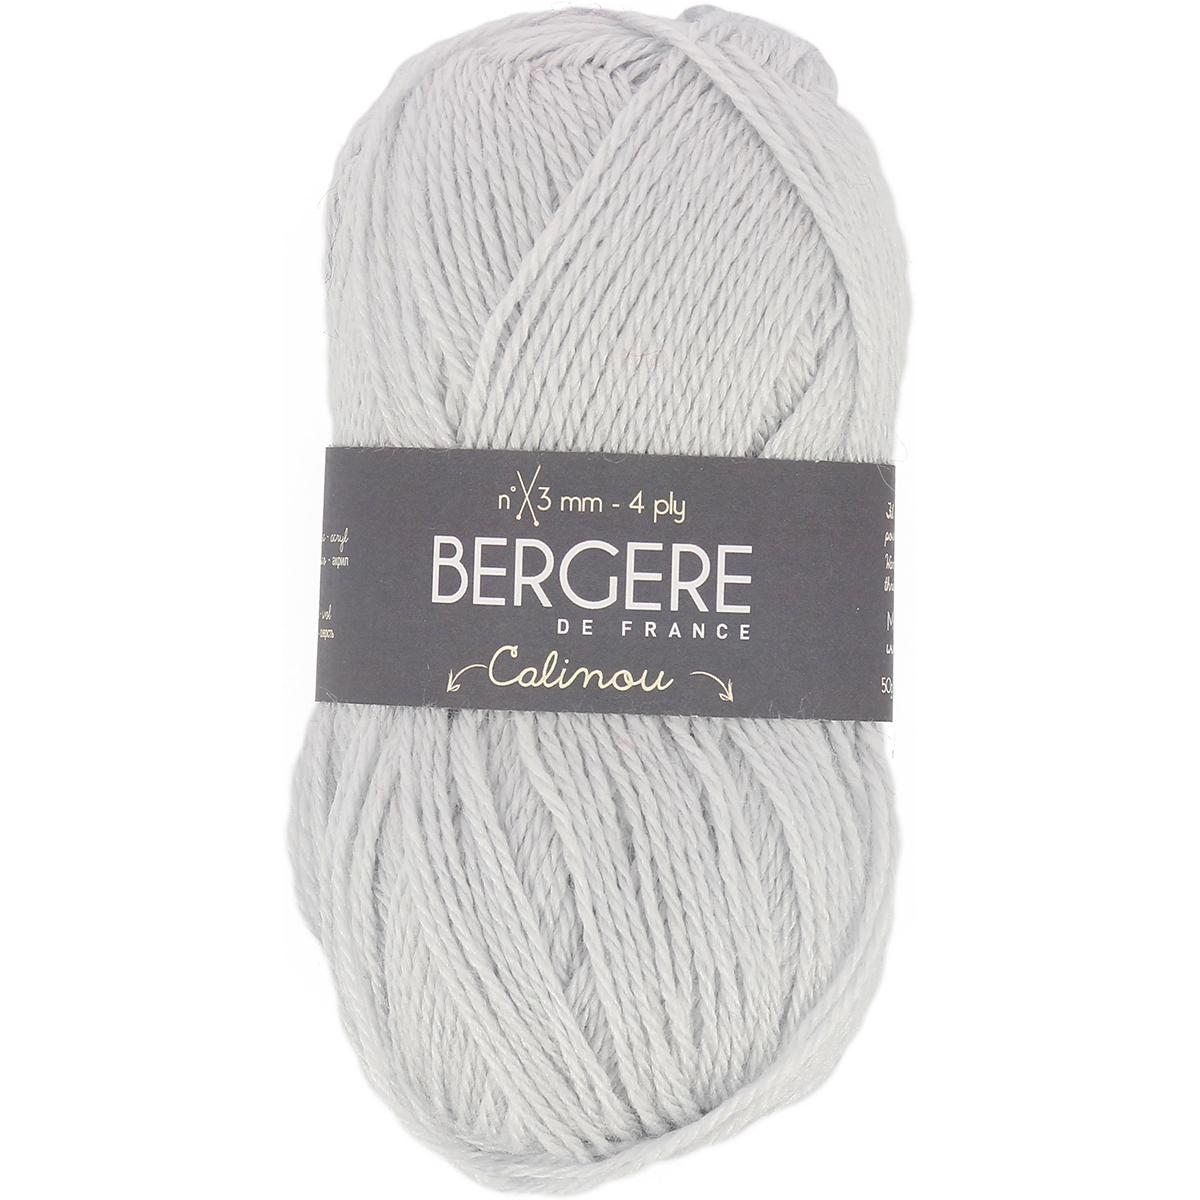 Bergere De France Calinou Yarn-Comete